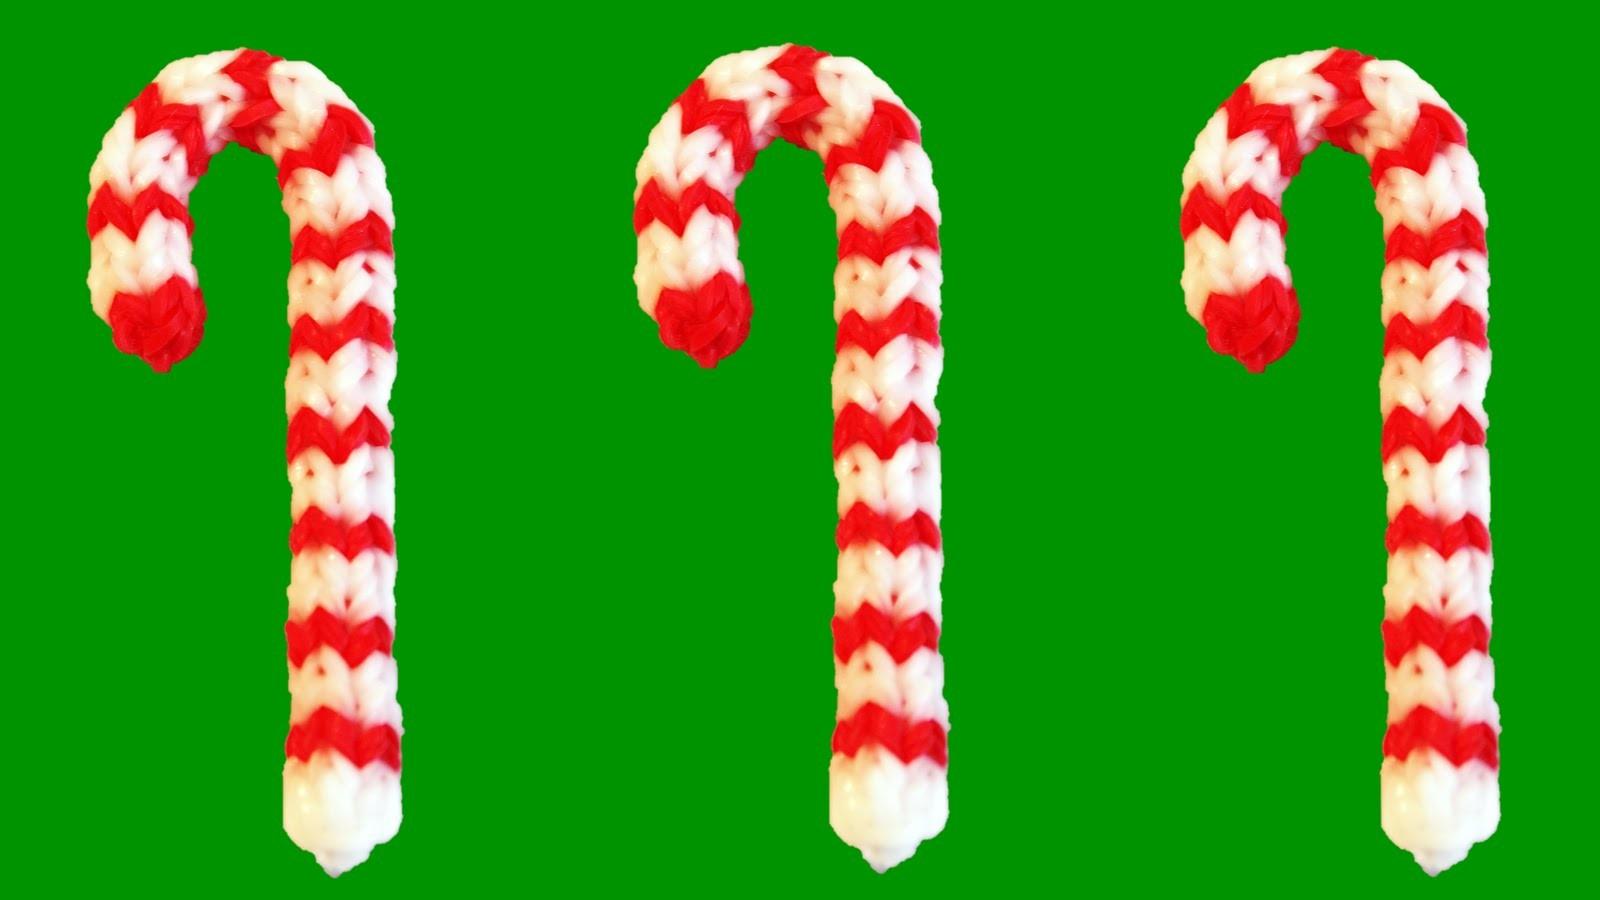 How to Make Loom Bands Christmas Candy Cane Rainbow Loom Christmas Charms